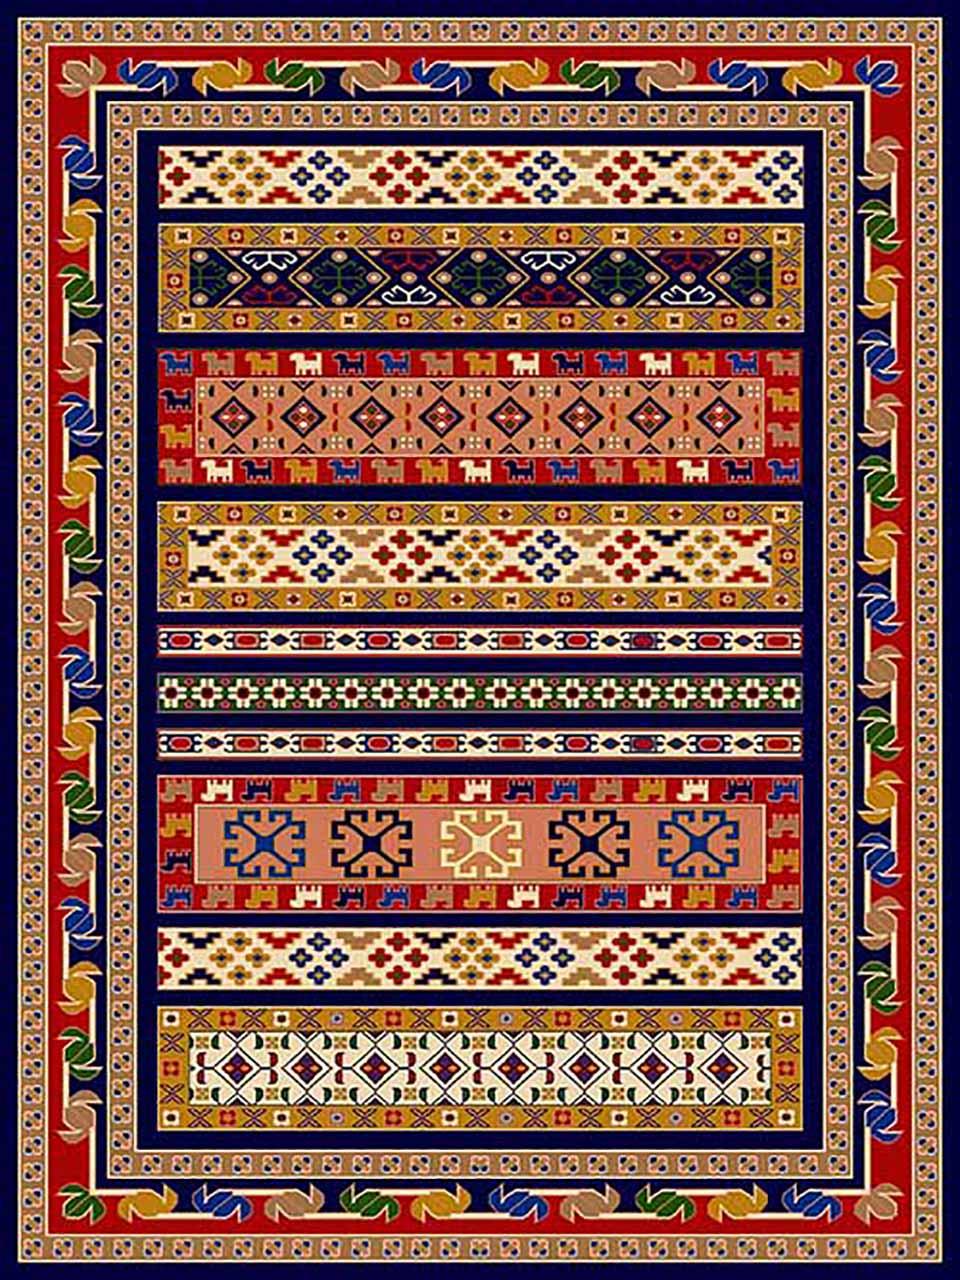 فرش (268) پلی پروپیلن - 8 رنگ - 320 شانه - سورمه ای - تراکم 960